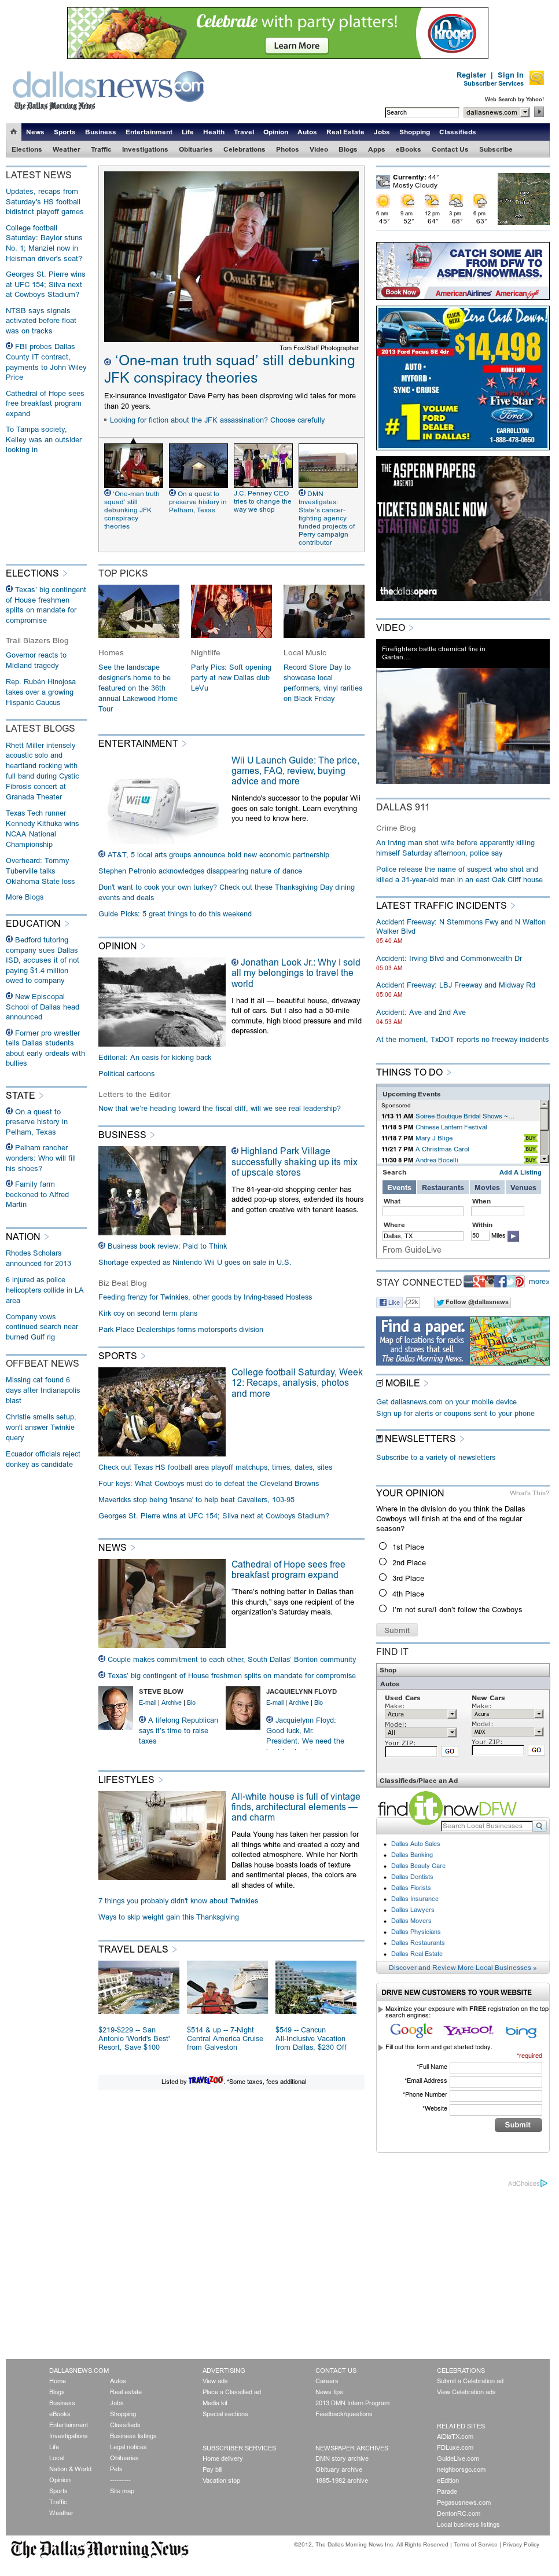 dallasnews.com at Sunday Nov. 18, 2012, 12:05 p.m. UTC